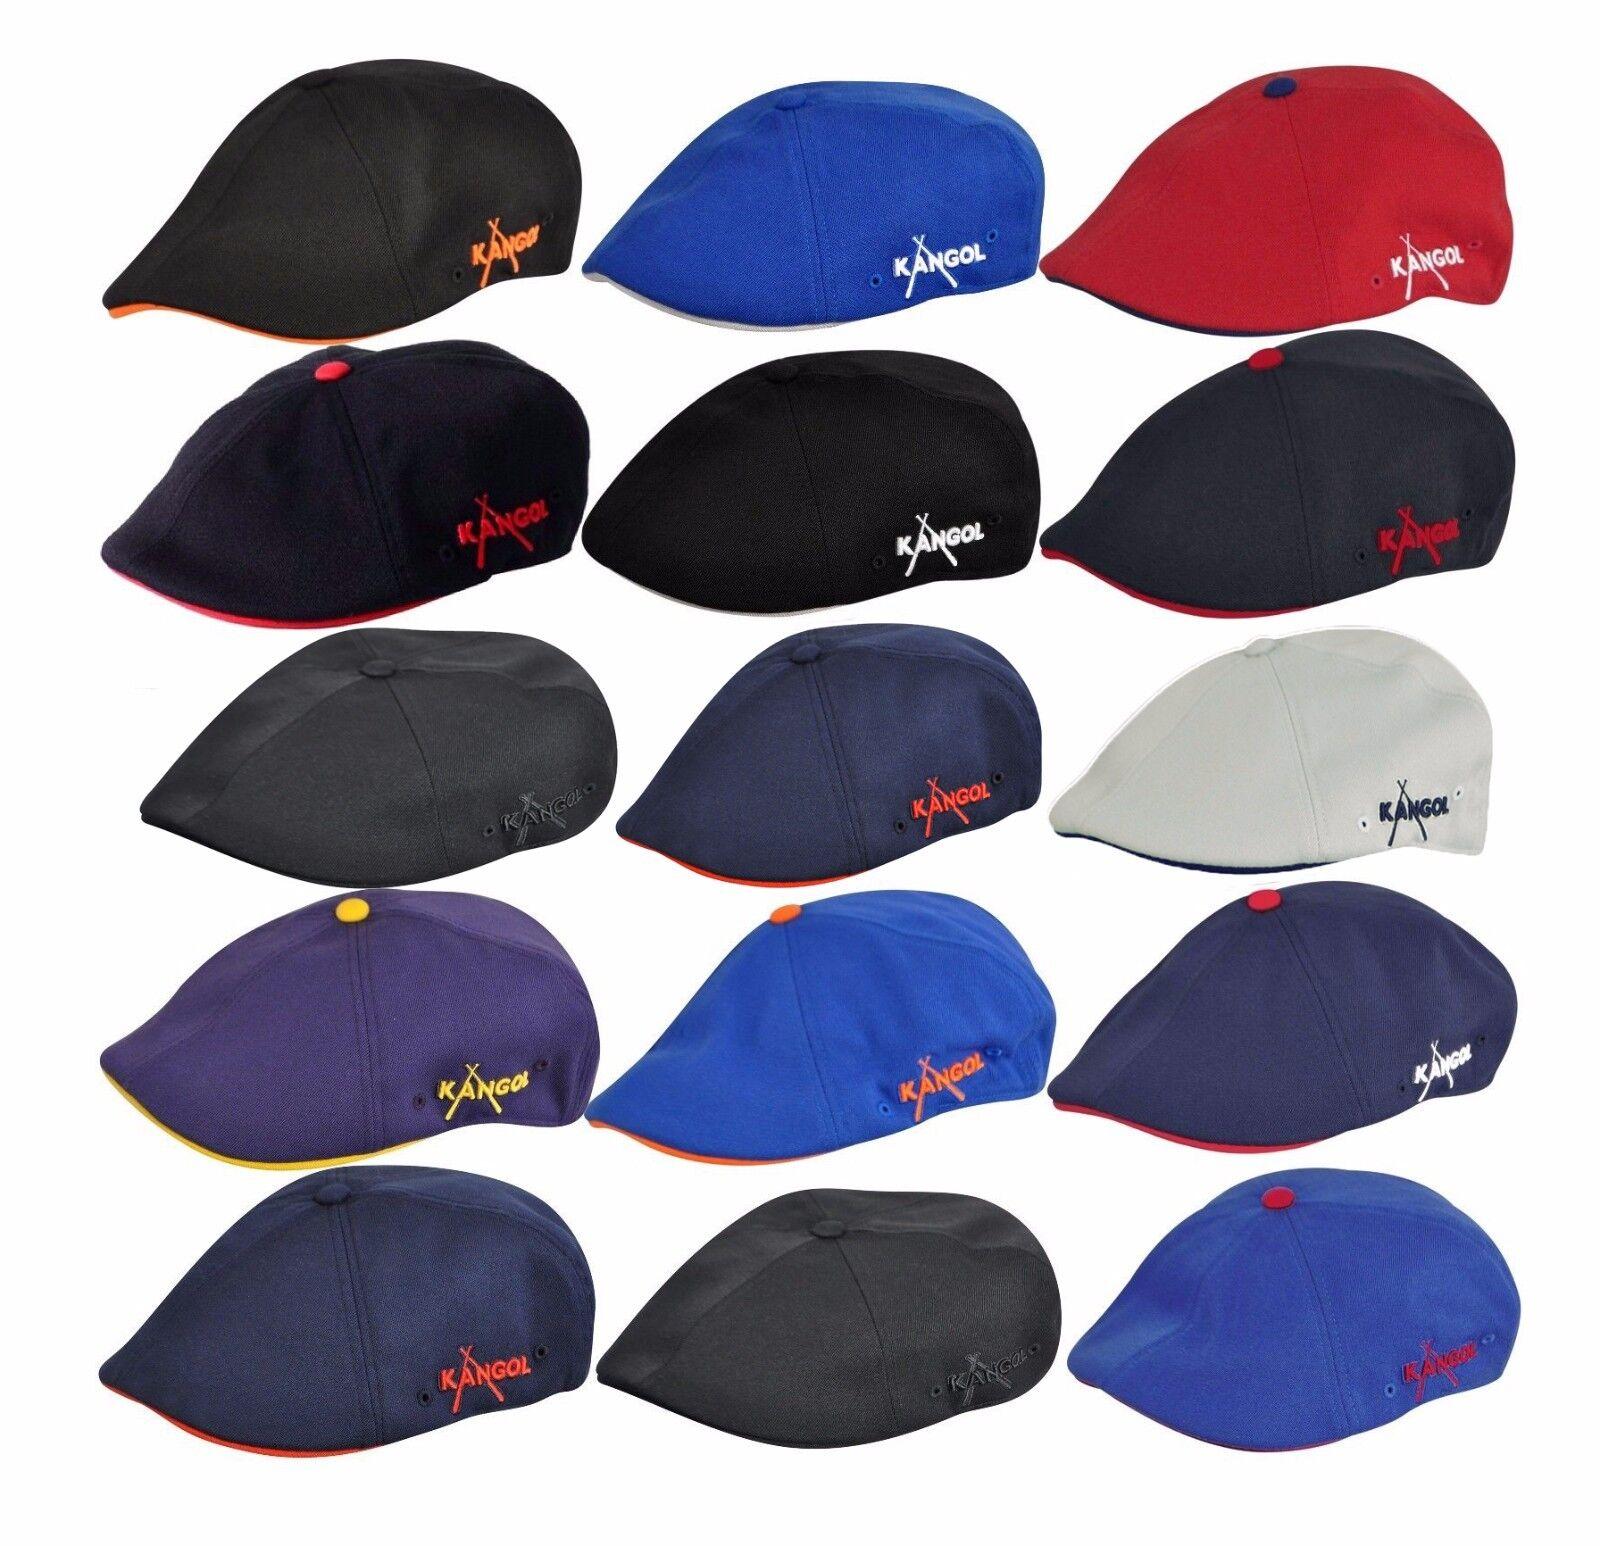 Kangol  Championship Series Flexfit  504  Cap  Team Colors  Navy//Cardinal